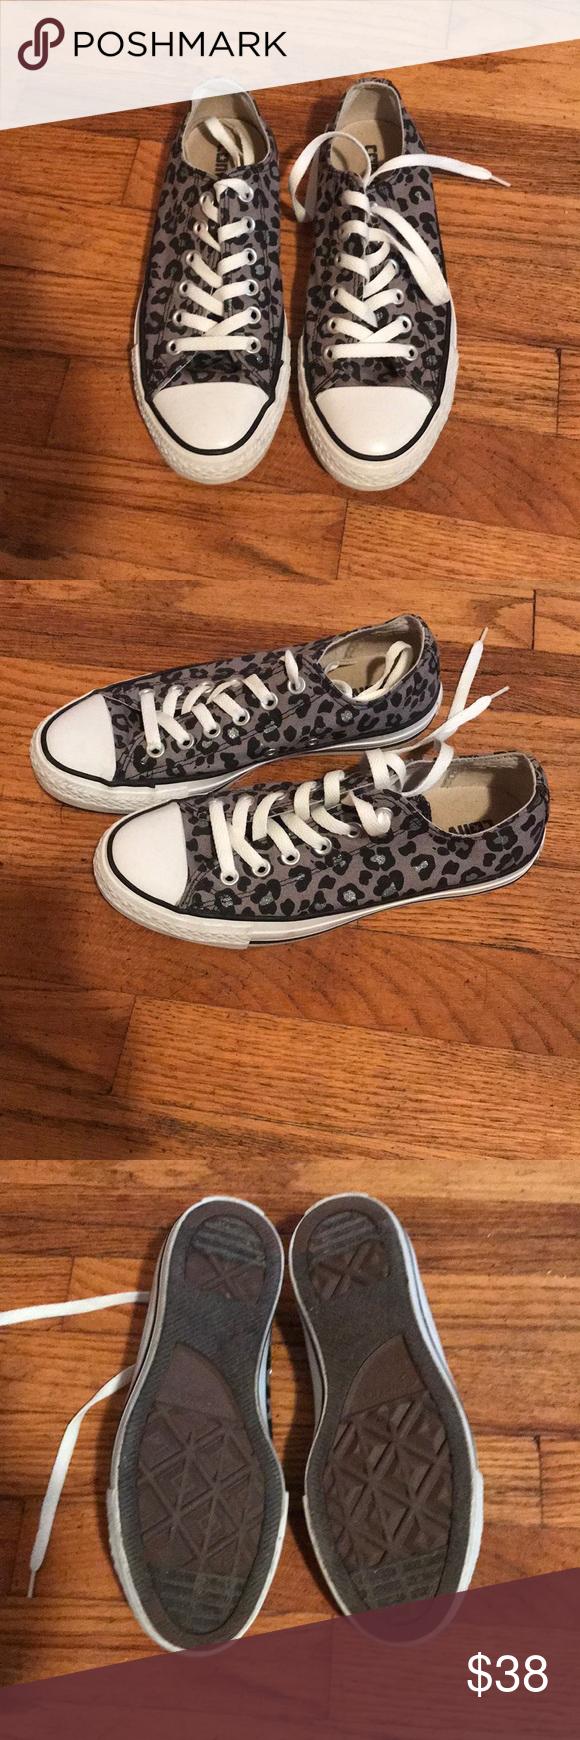 leopard print converse size 7